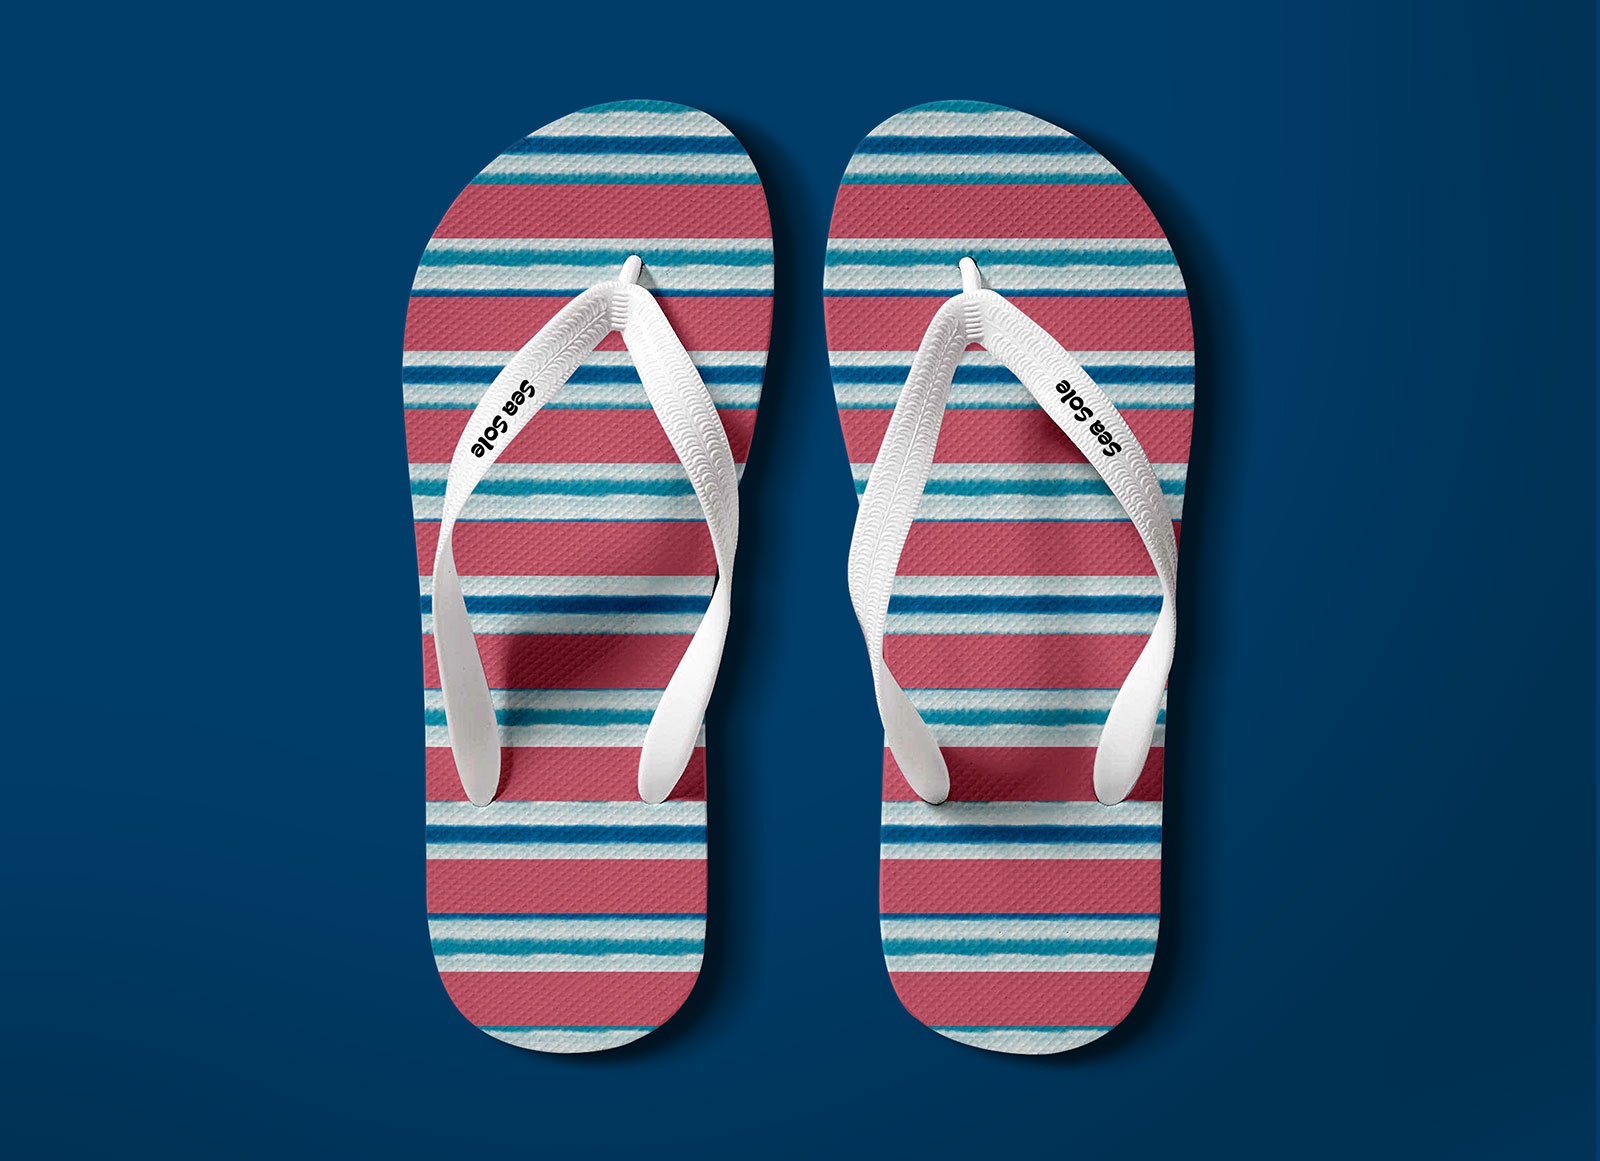 5115e94fc Free Flip Flops Beach Slippers Mockup PSD - Good Mockups